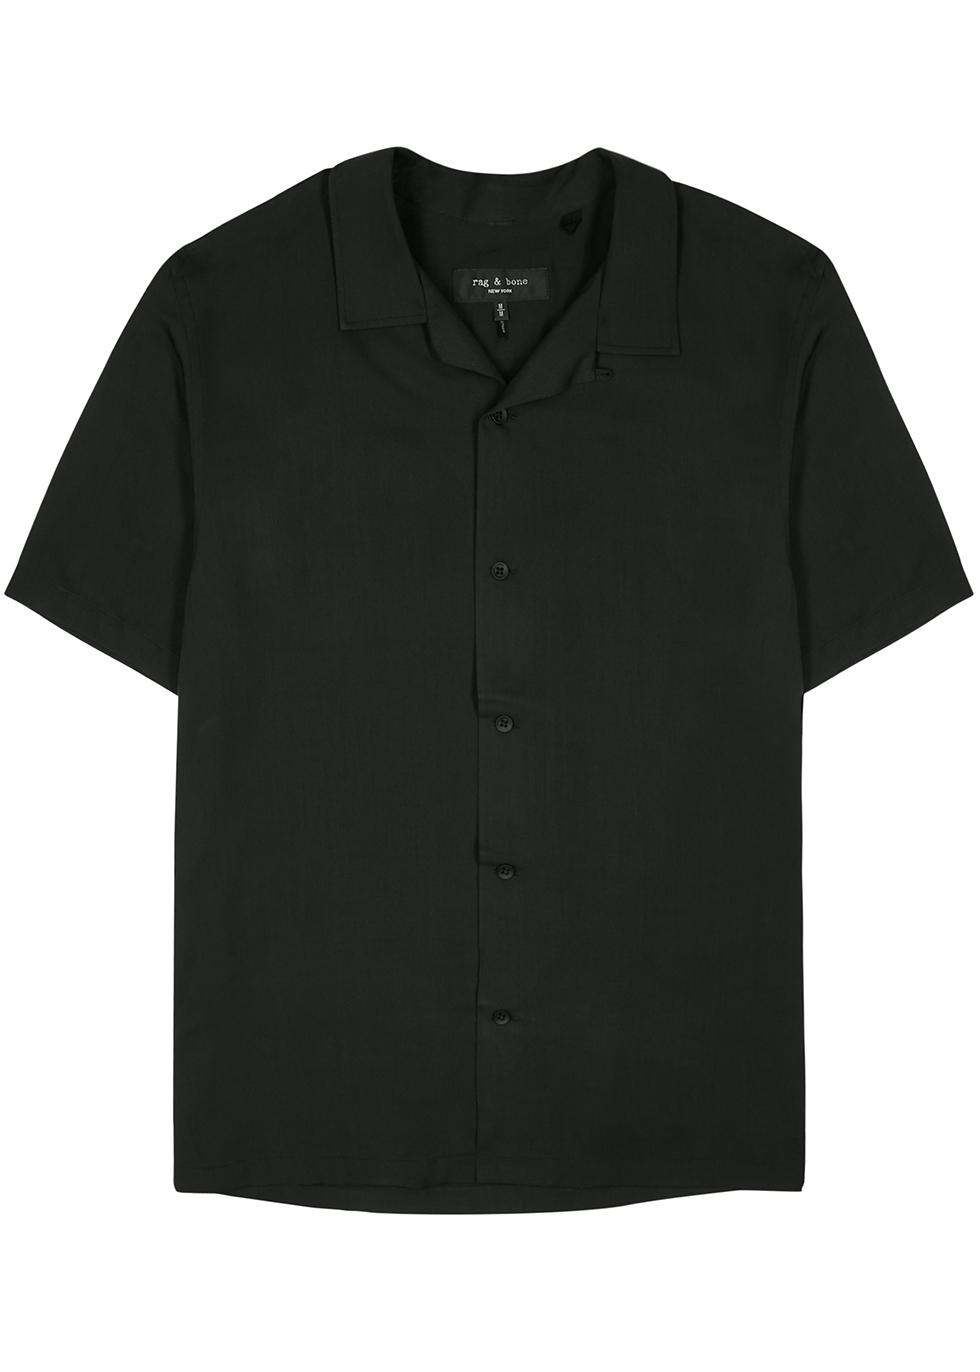 Avery black twill shirt